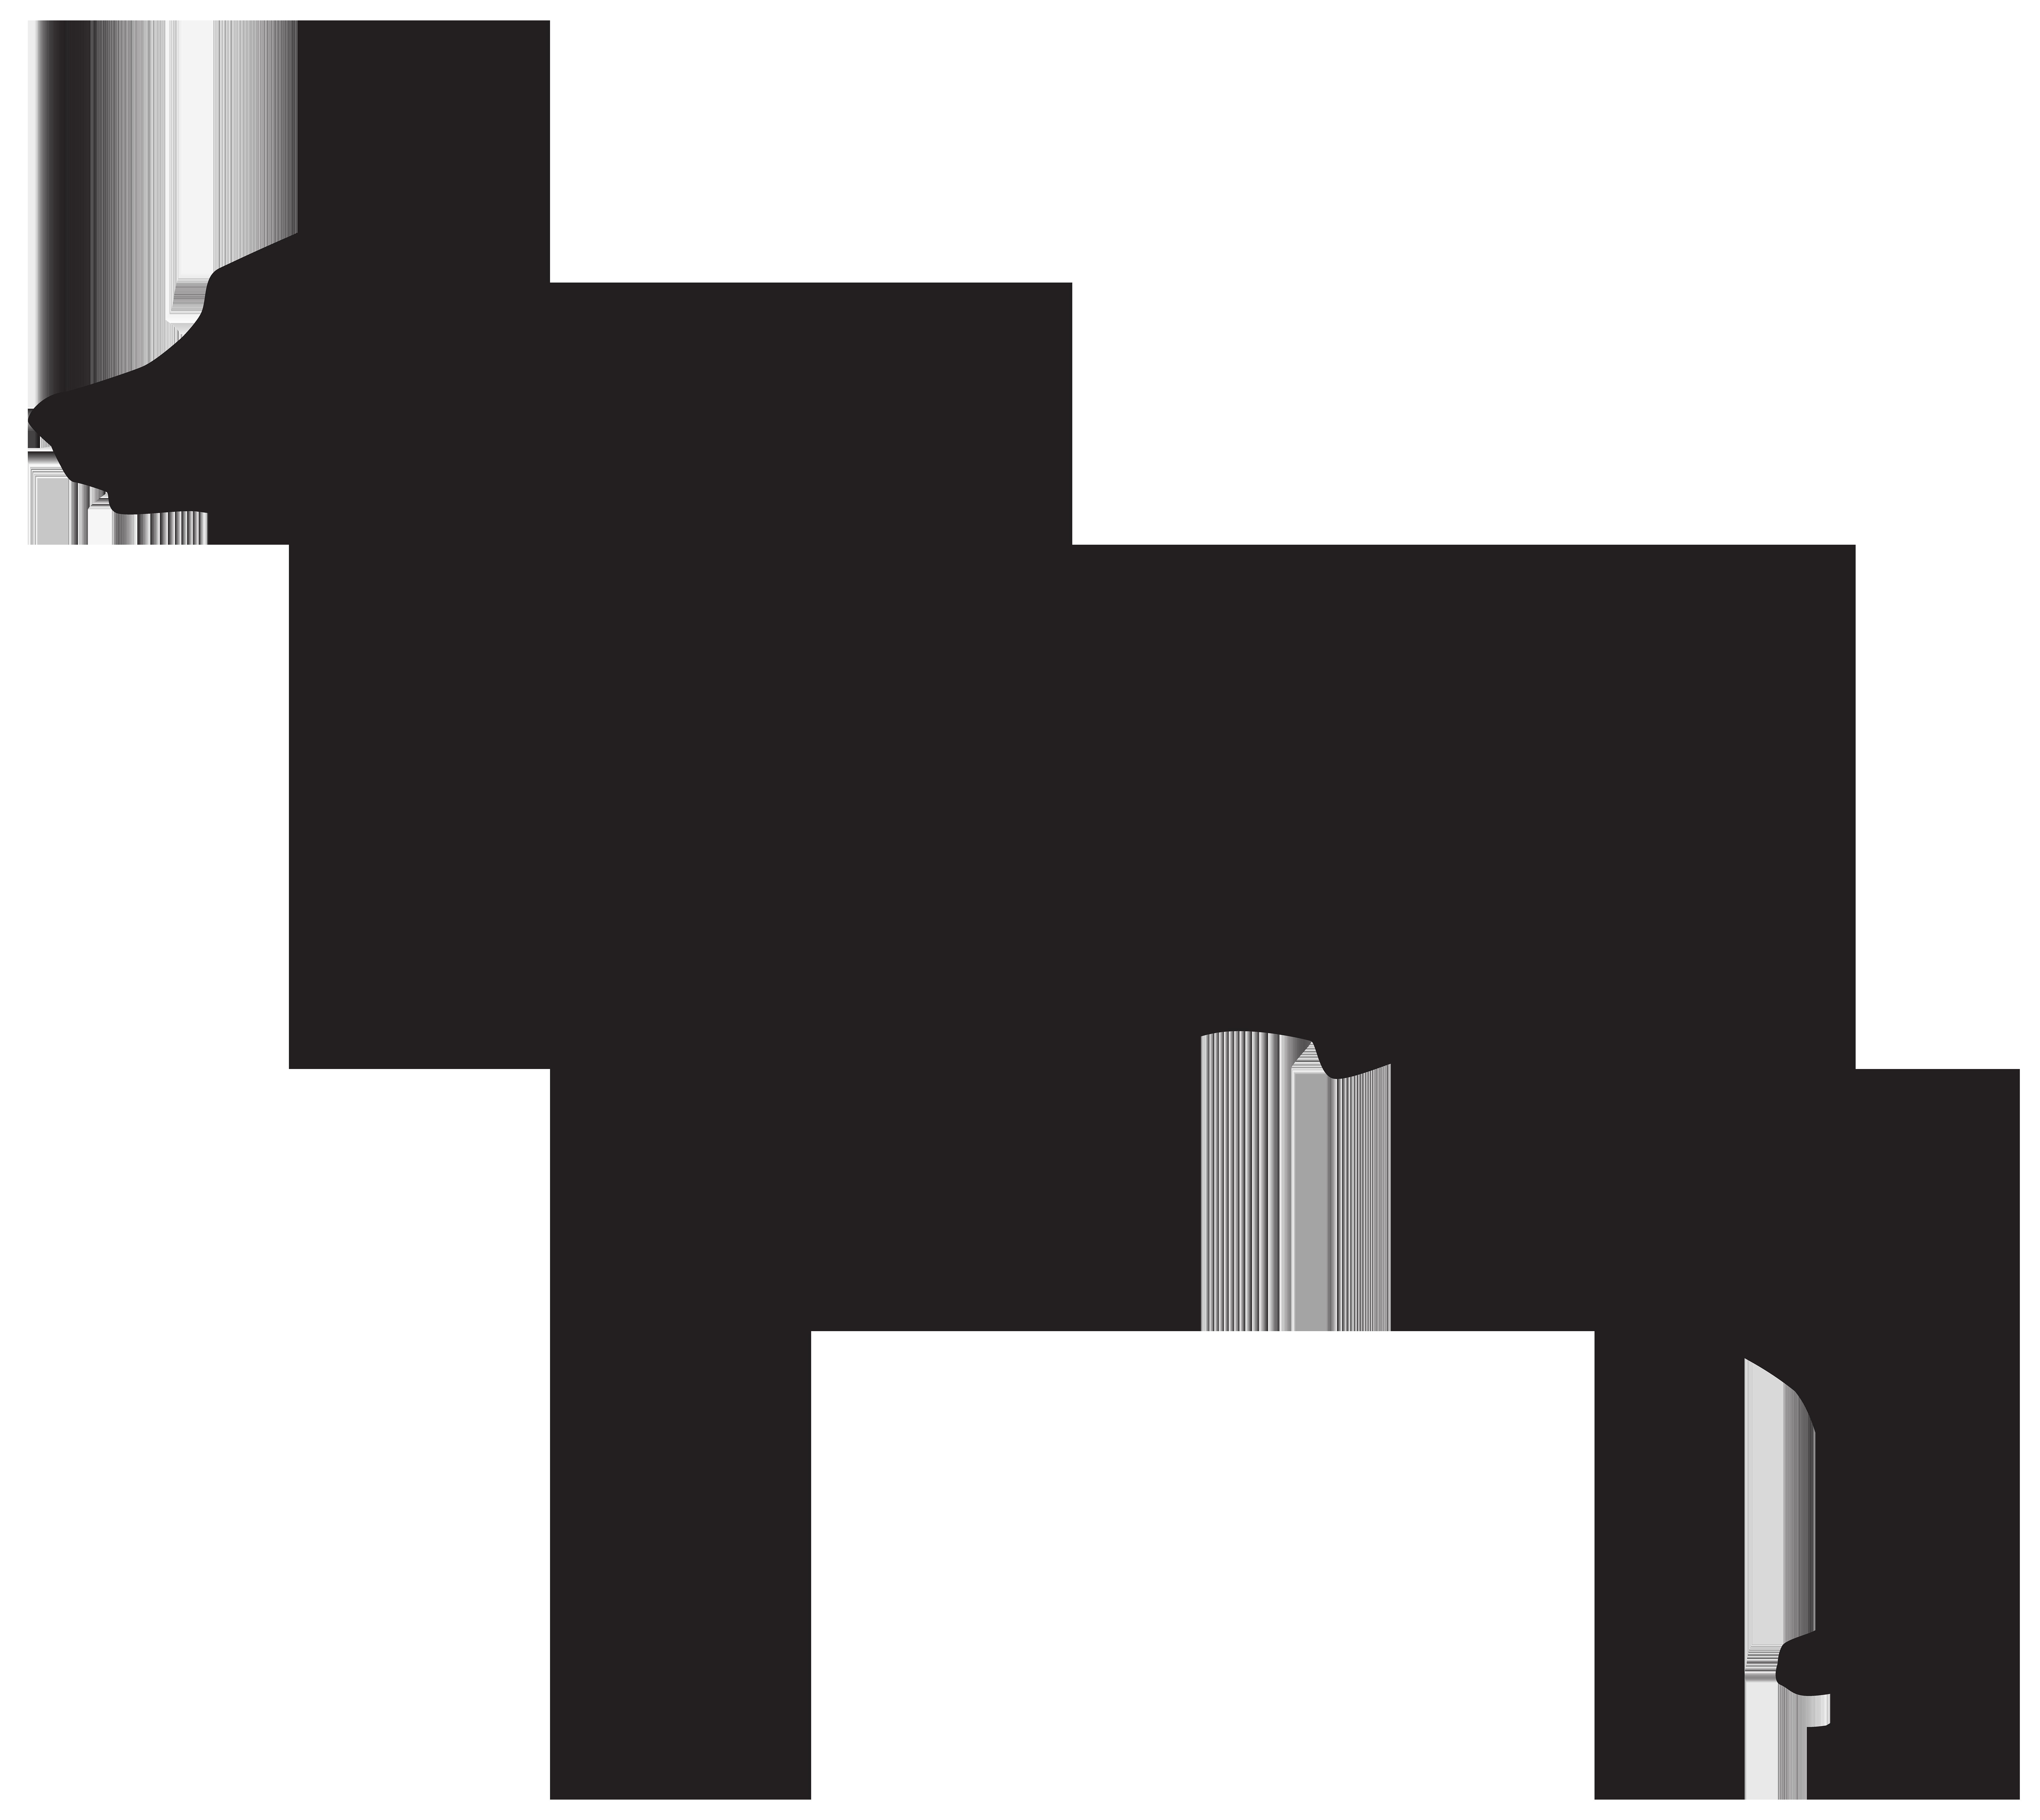 Doberman Dog Silhouette PNG Transparent Clip Art Image.